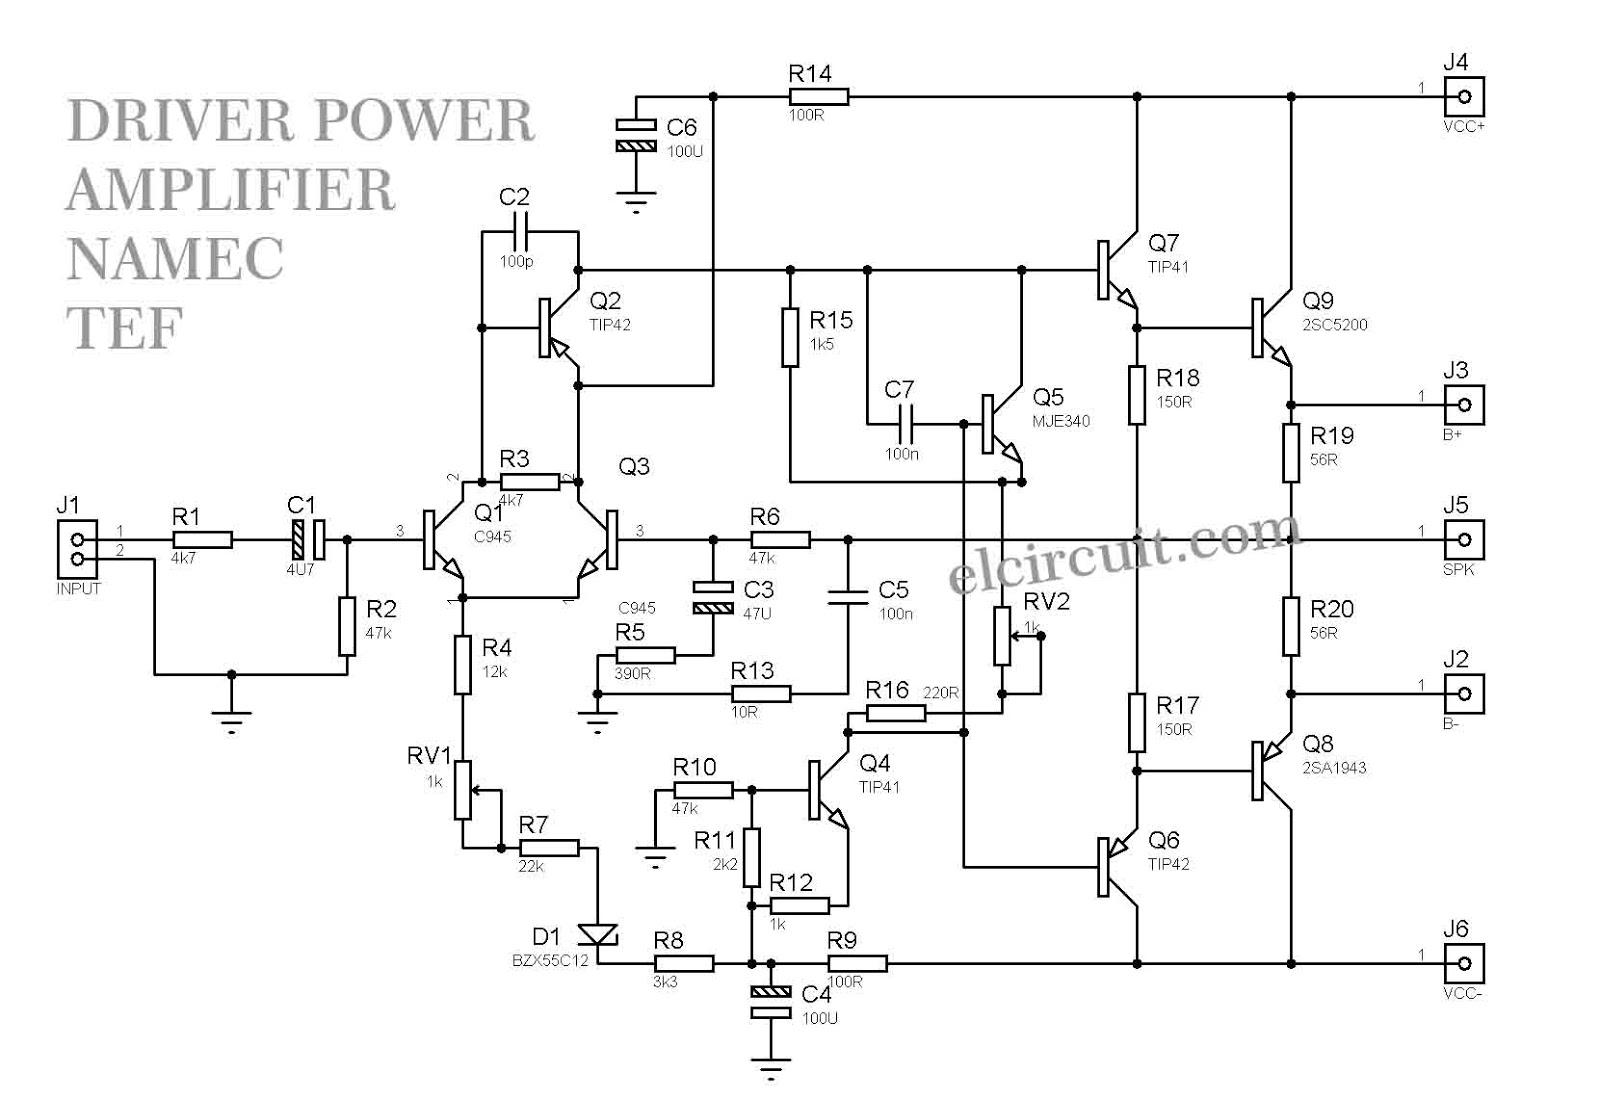 1000W Driver Power Amplifier Namec TEF Electronic Circuit